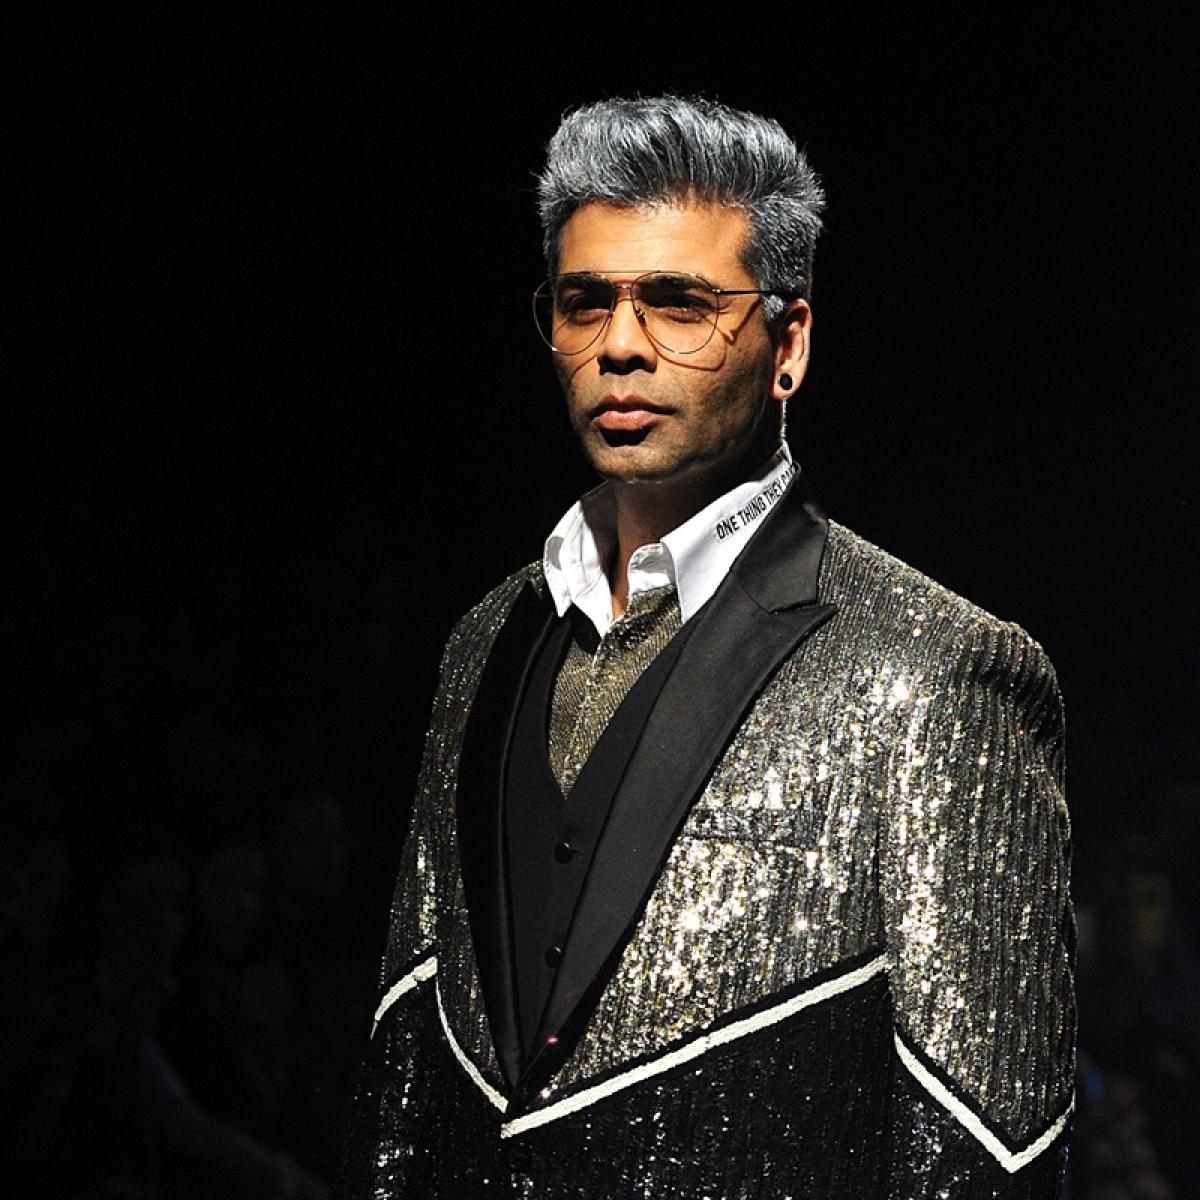 I won't apologise for films I have made, says Karan Johar